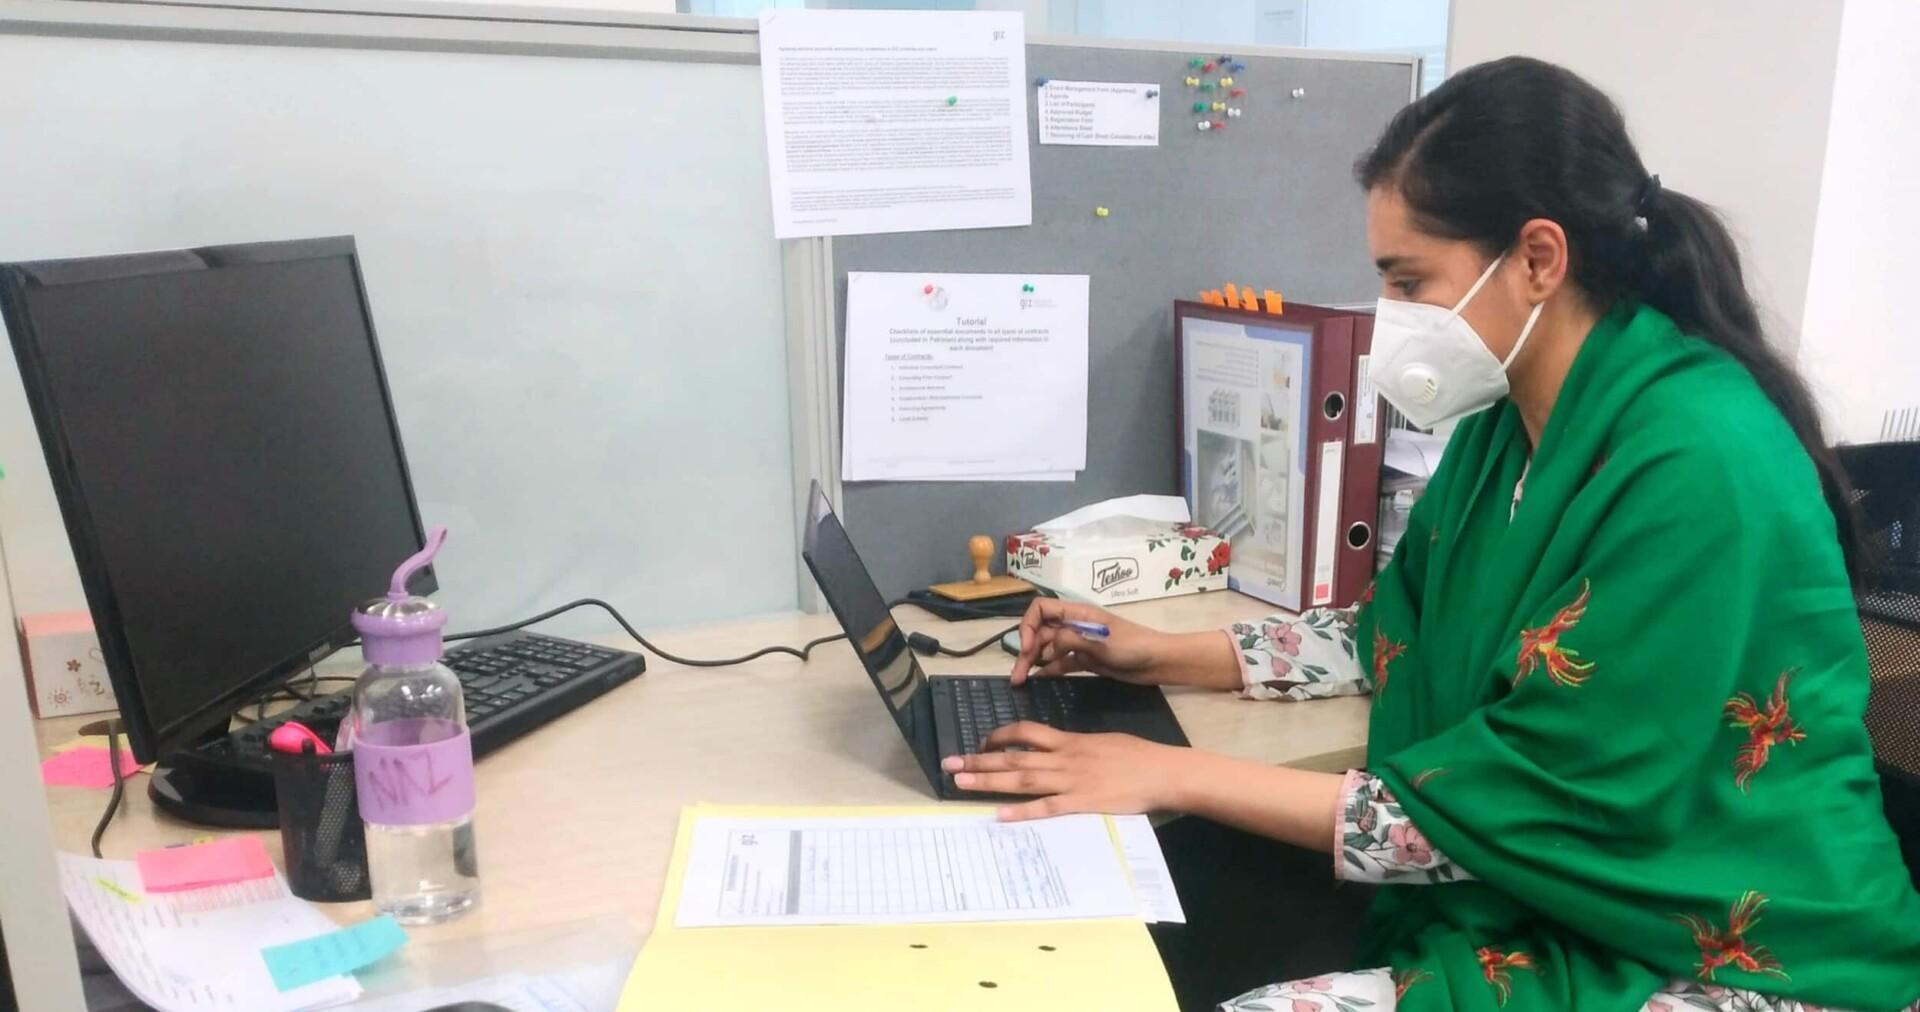 Gul Rukh Mehboob, GIZ Technical Advisor